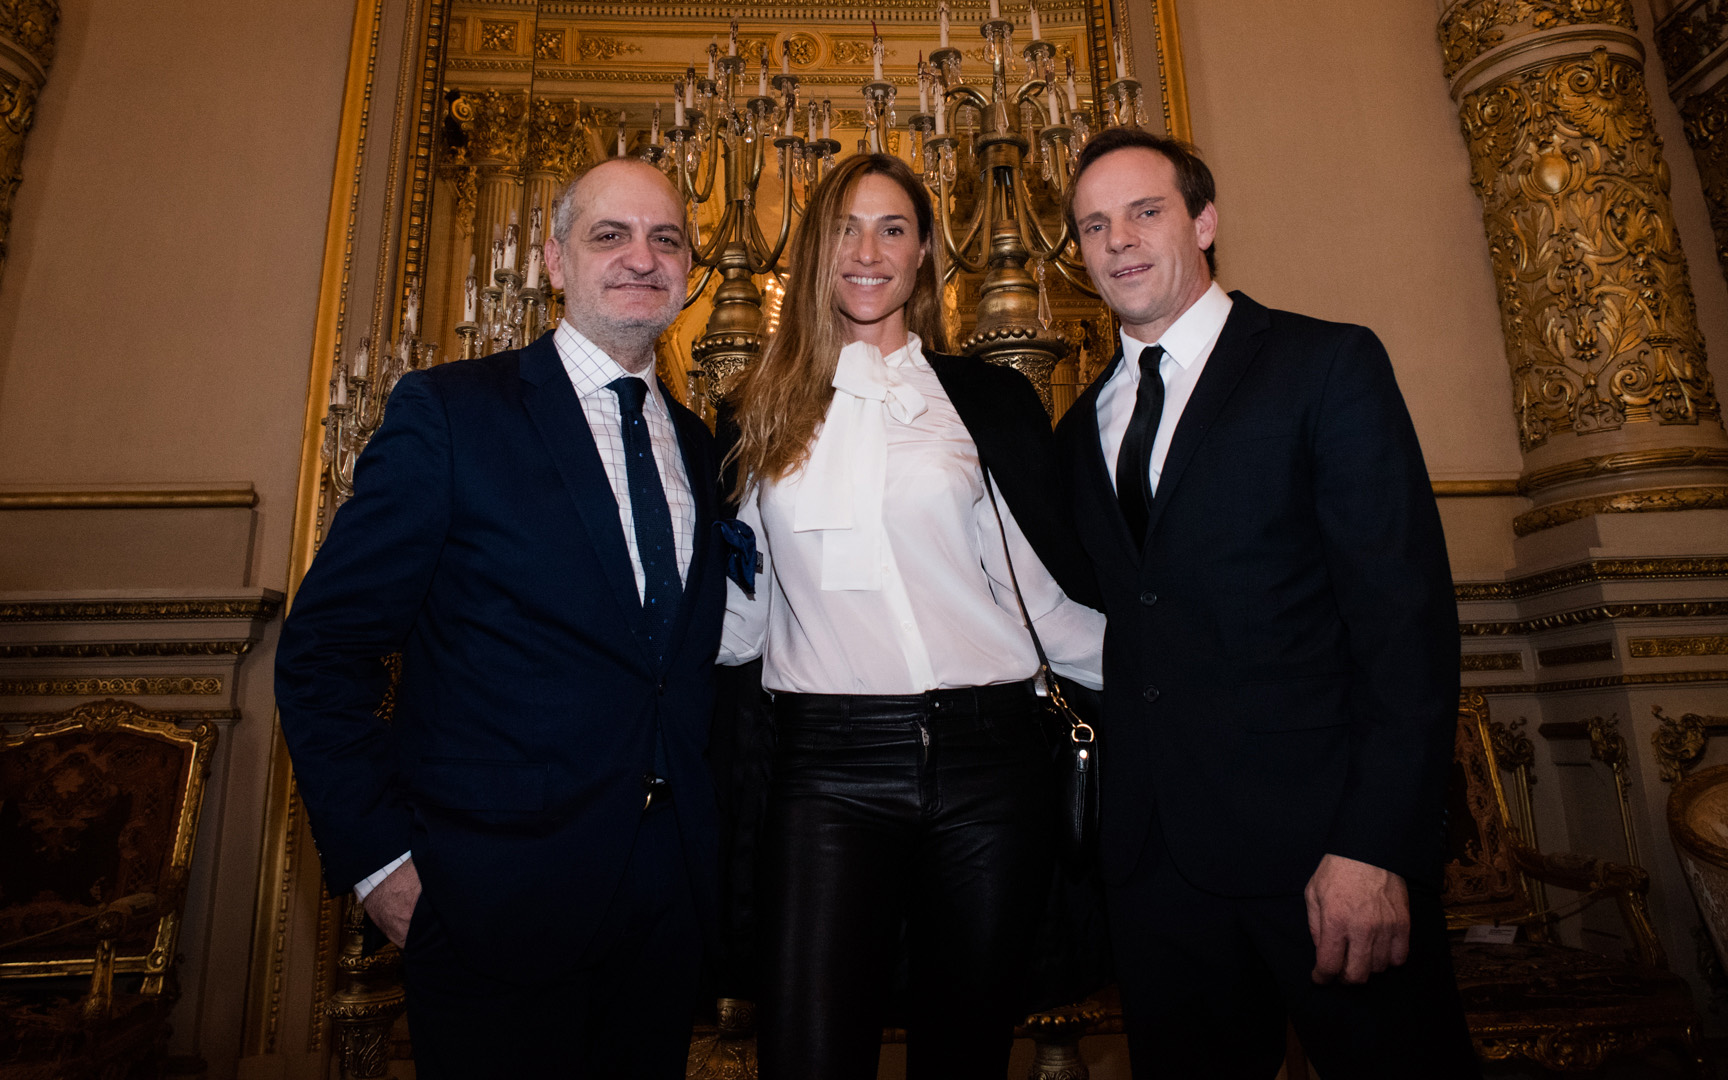 Laurencio Adot, Lara Bernasconi y Thiago Pinheiro